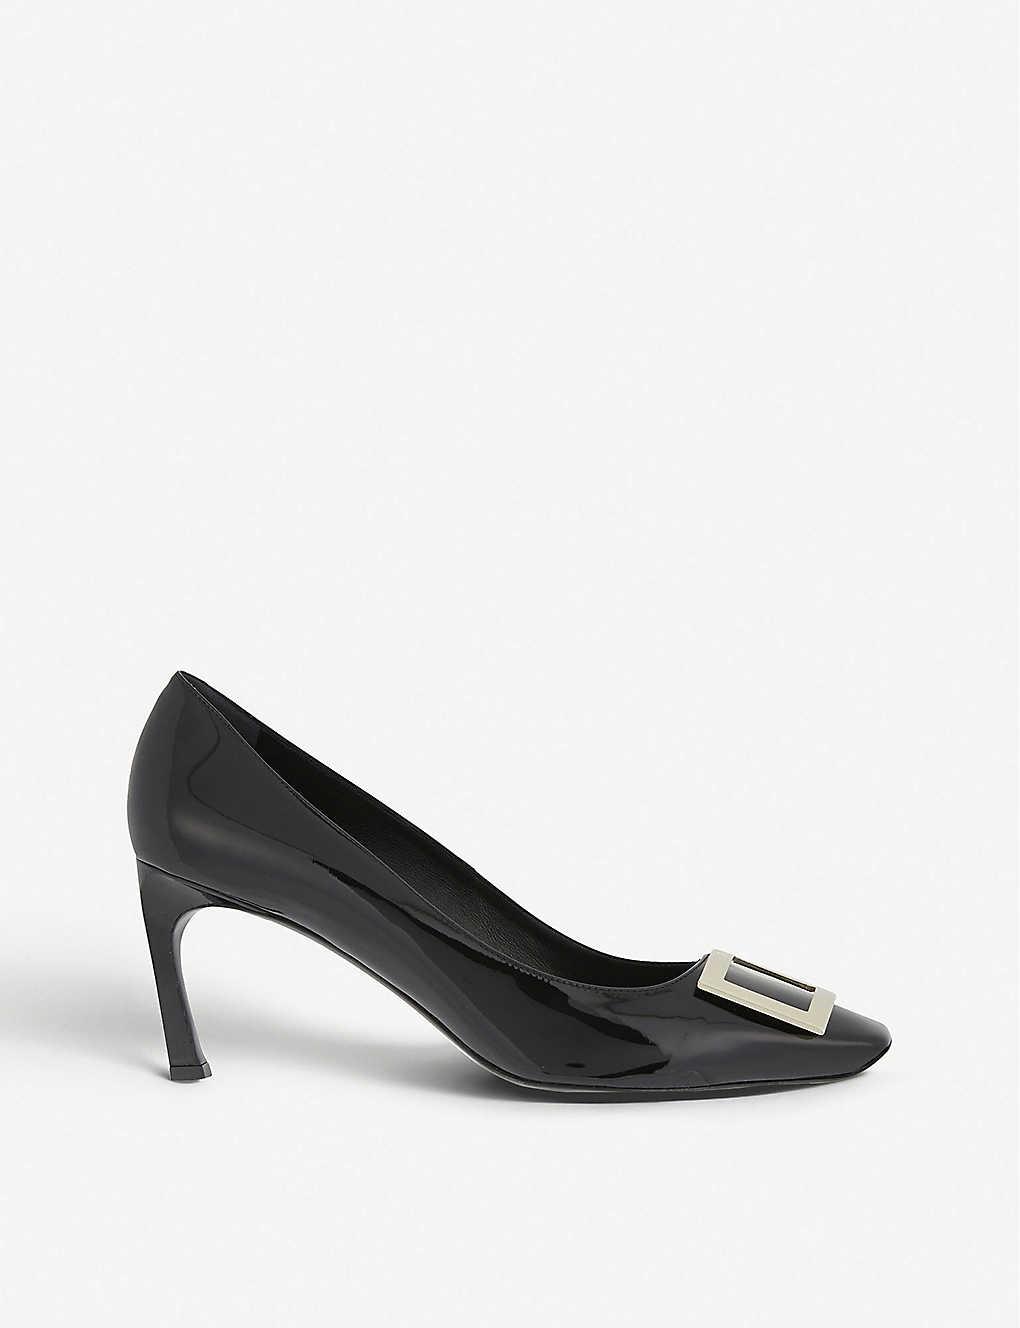 Belle Vivier patent leather courts(3949911)